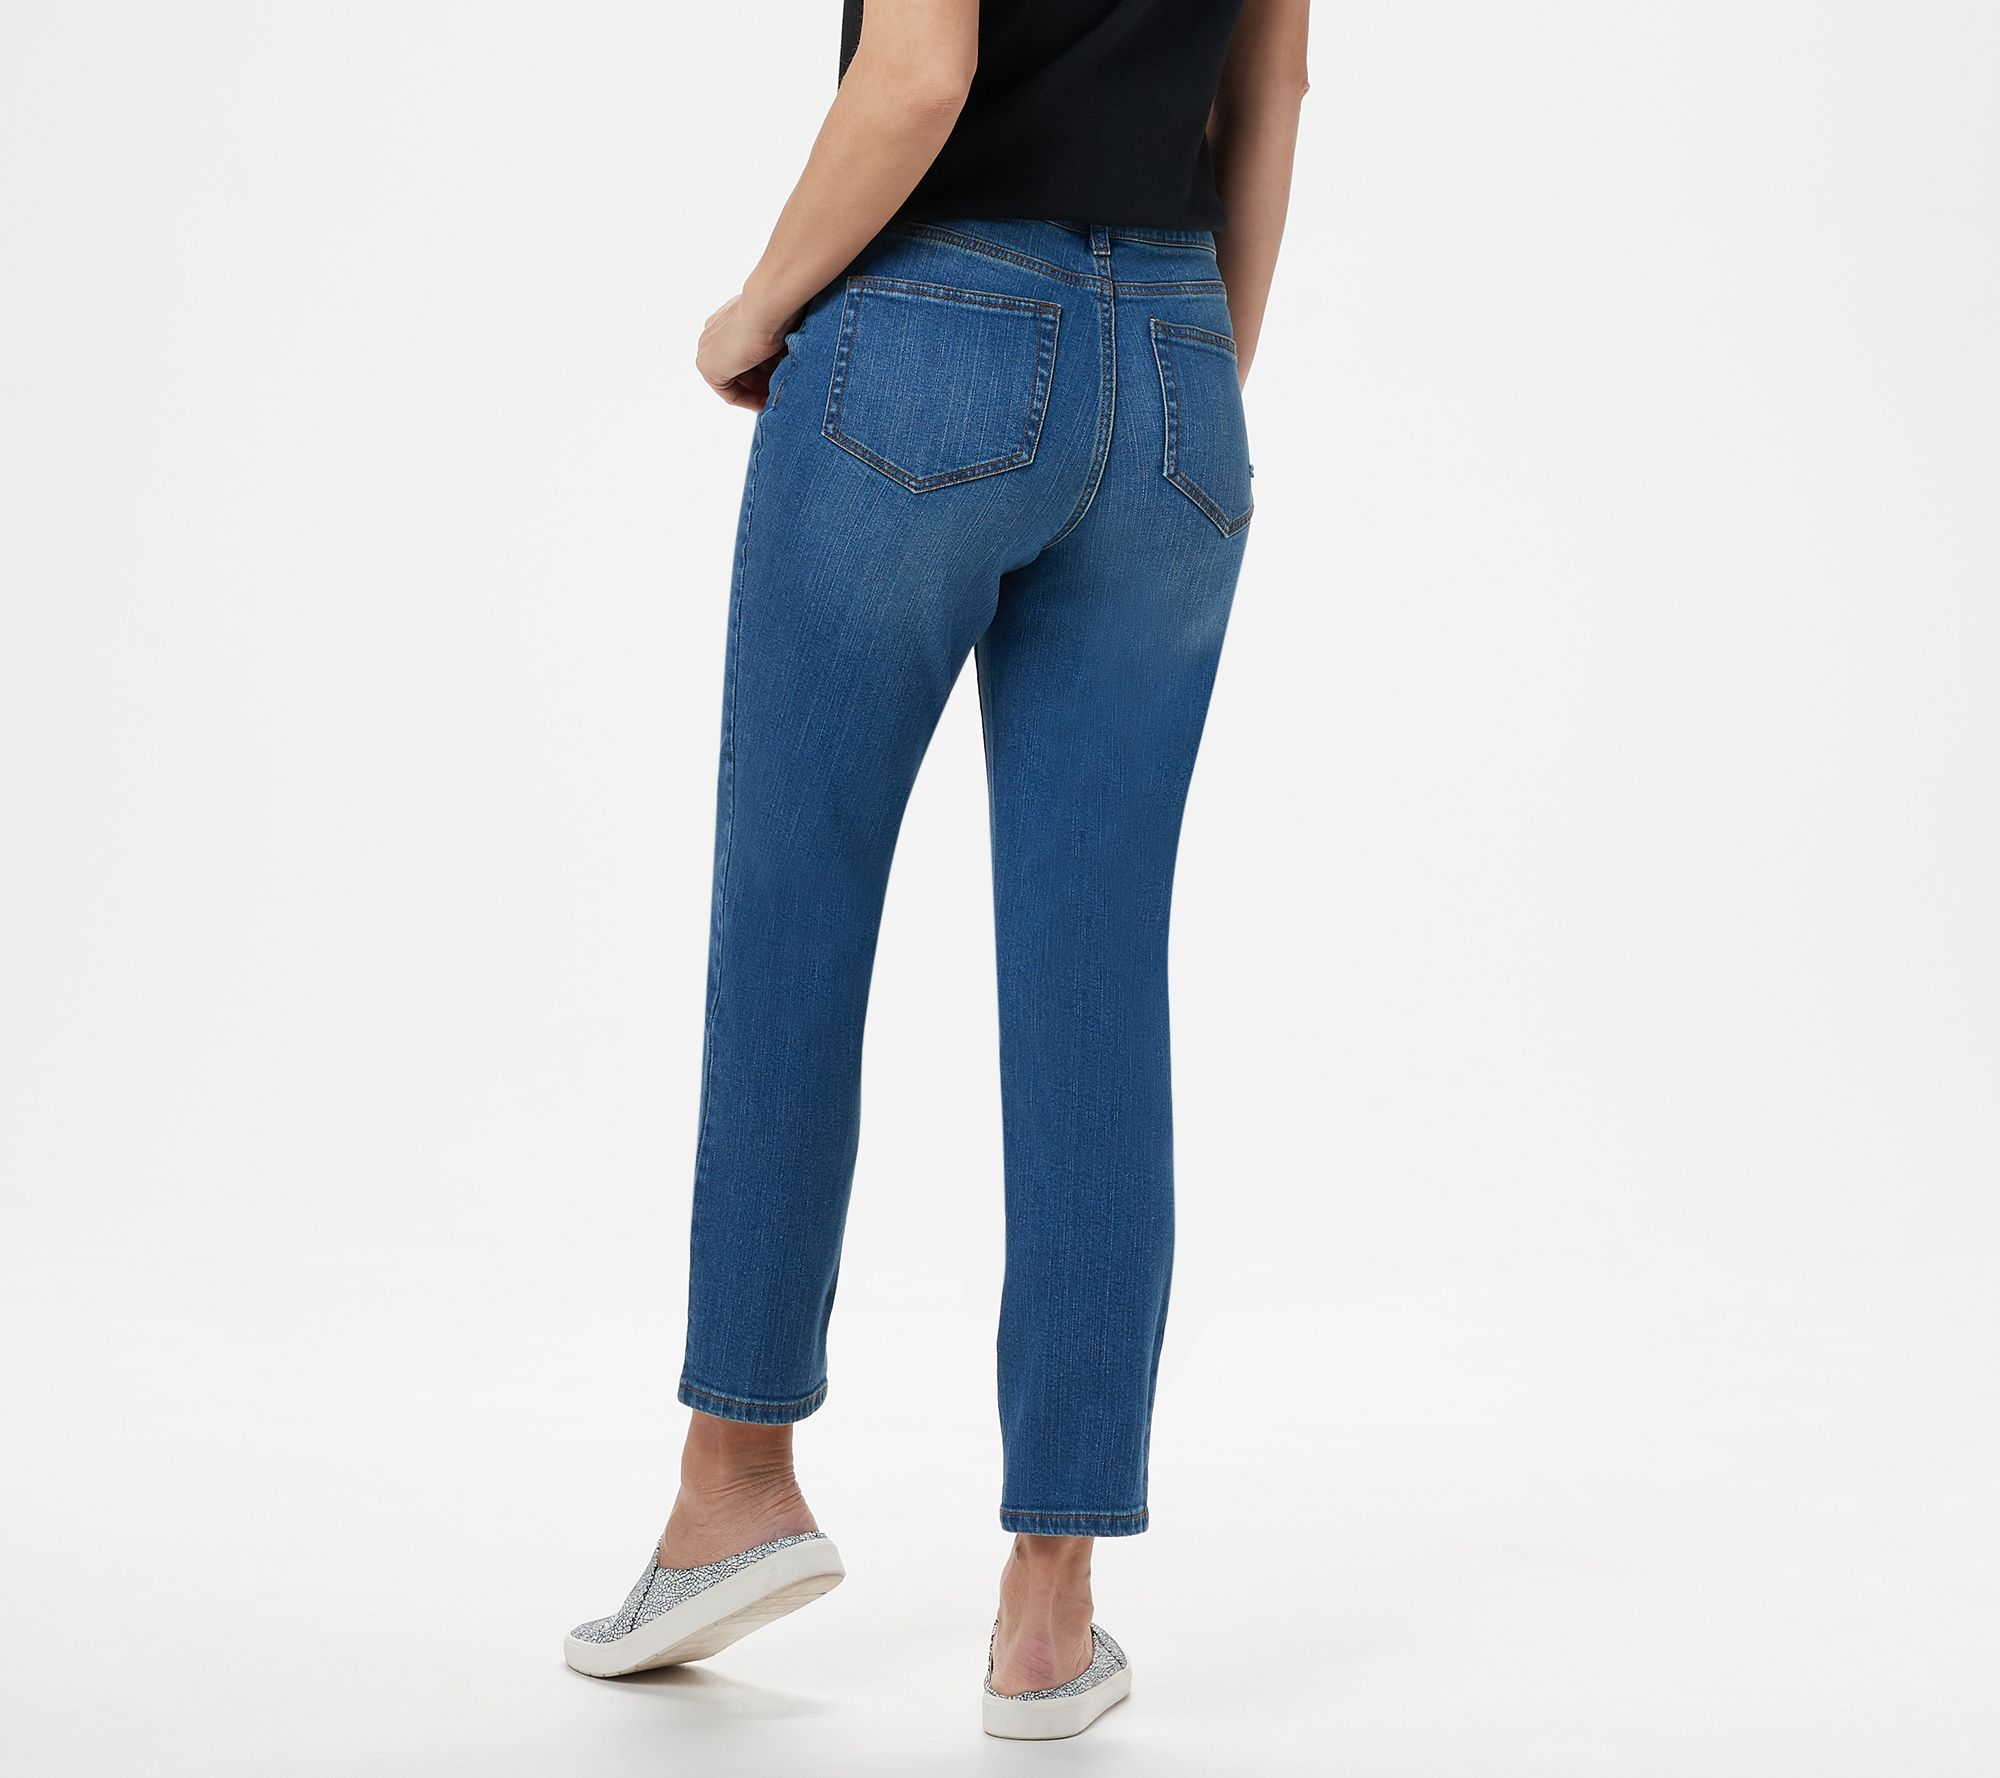 4aca7cc8f4 Studio by Denim & Co. Regular Classic Denim Ankle Jeans - Indigo ...